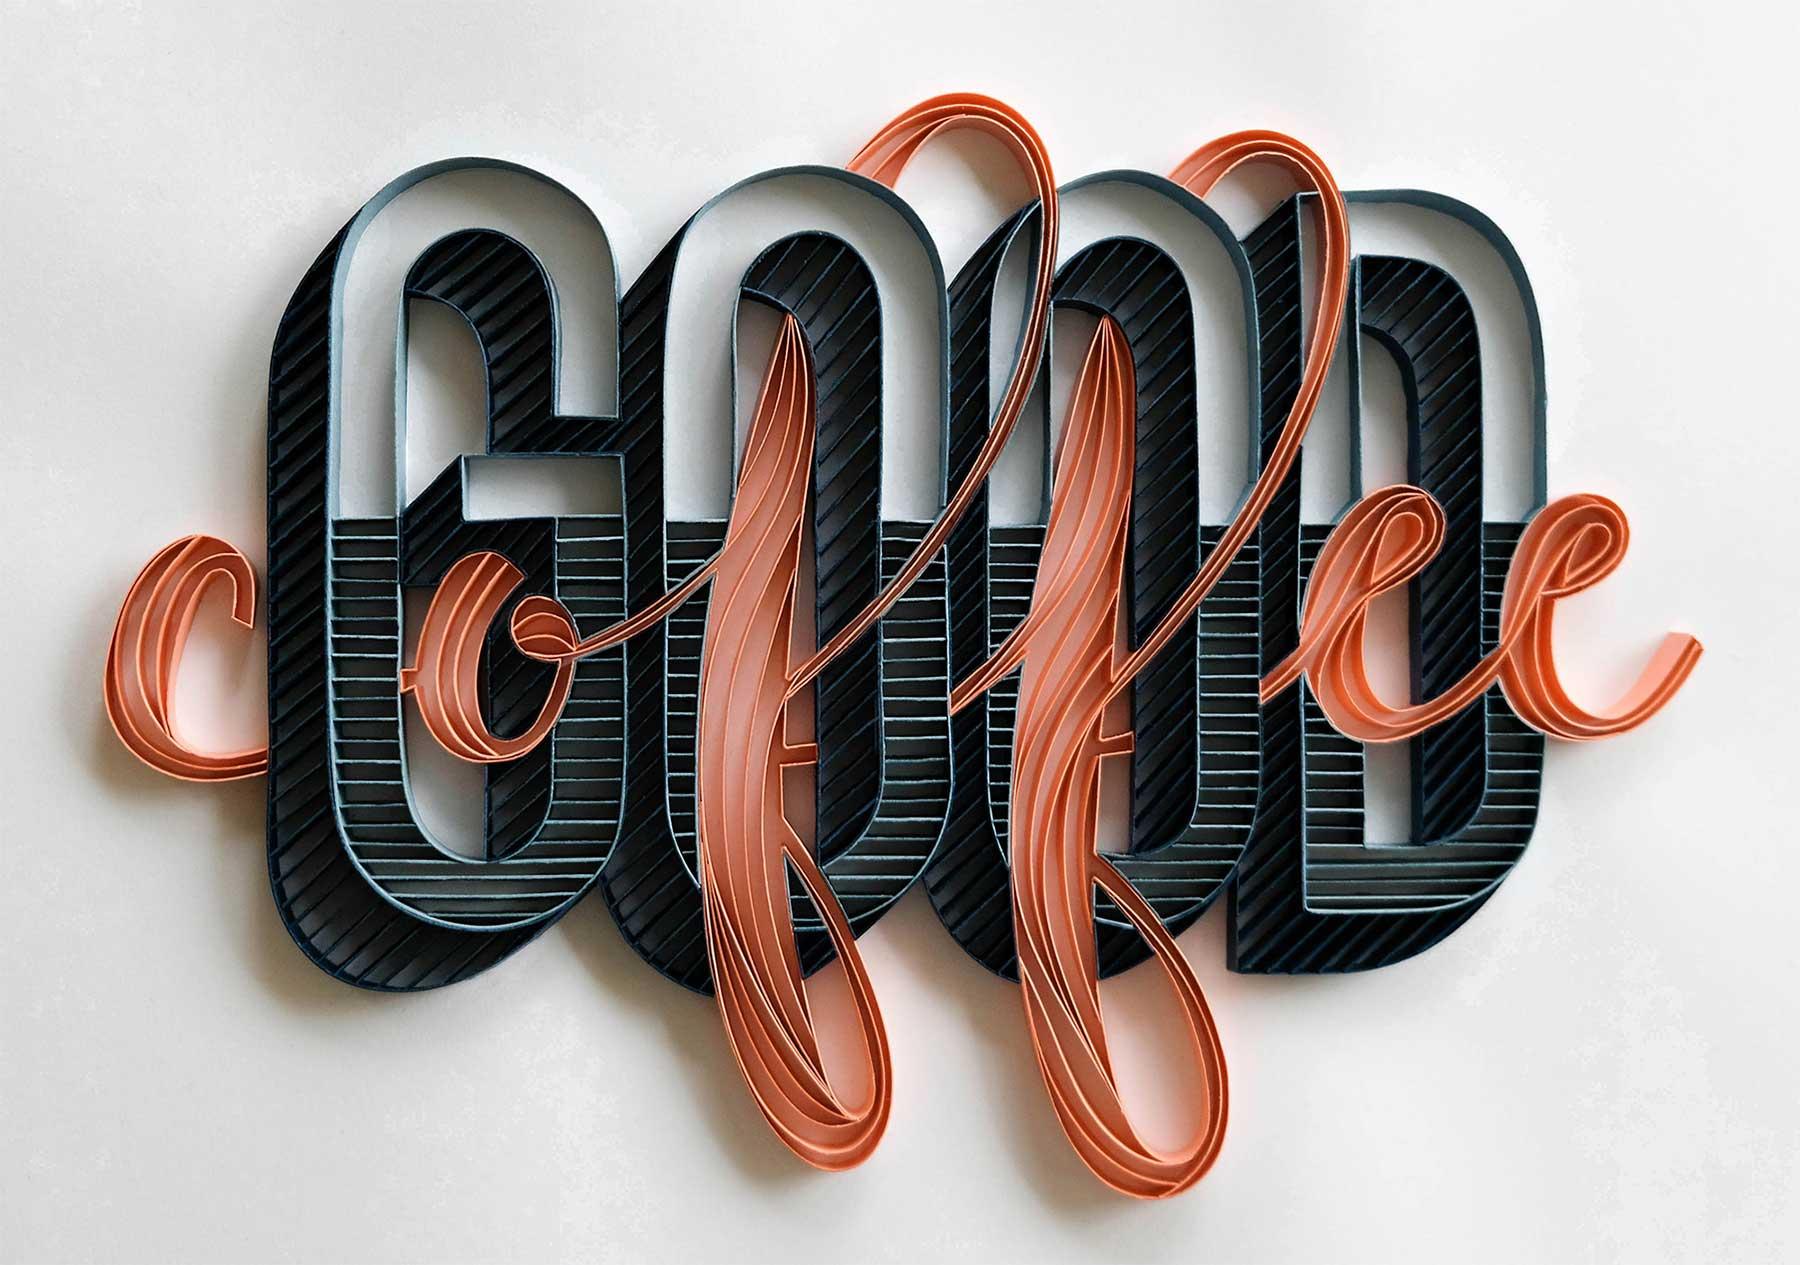 3D-Papier-Lettering von Alia Bright Alia-Bright-paperlettering_01